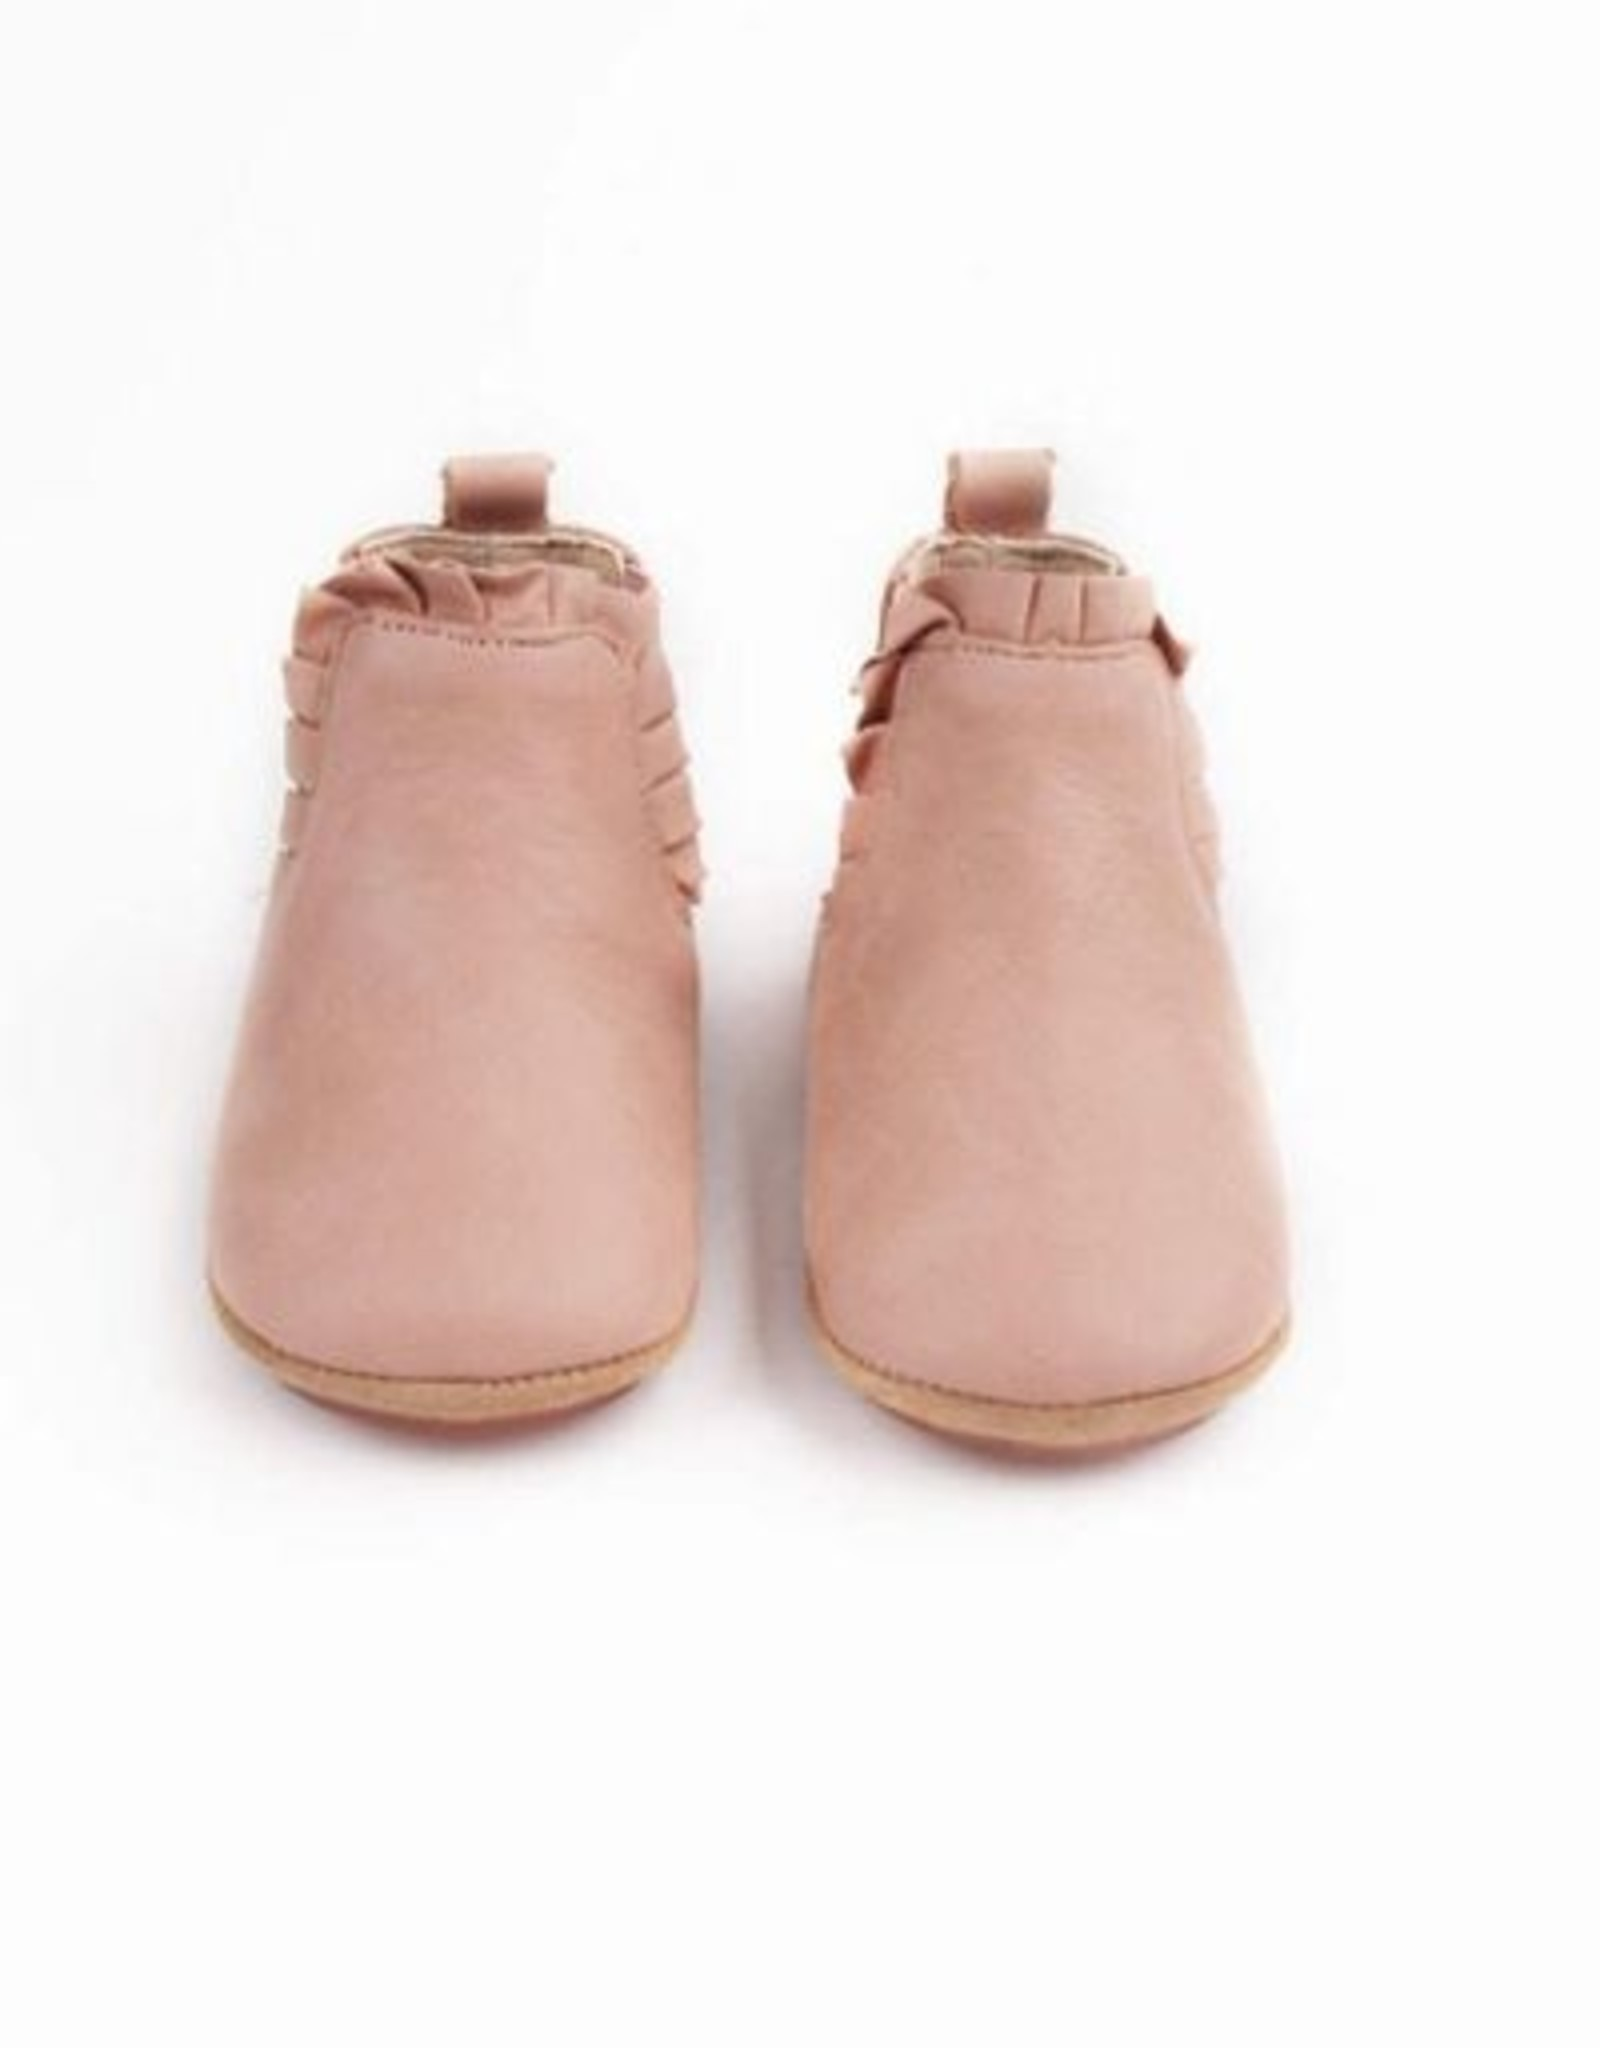 Teddy & James Chelsea boots ruffles -  Rosie